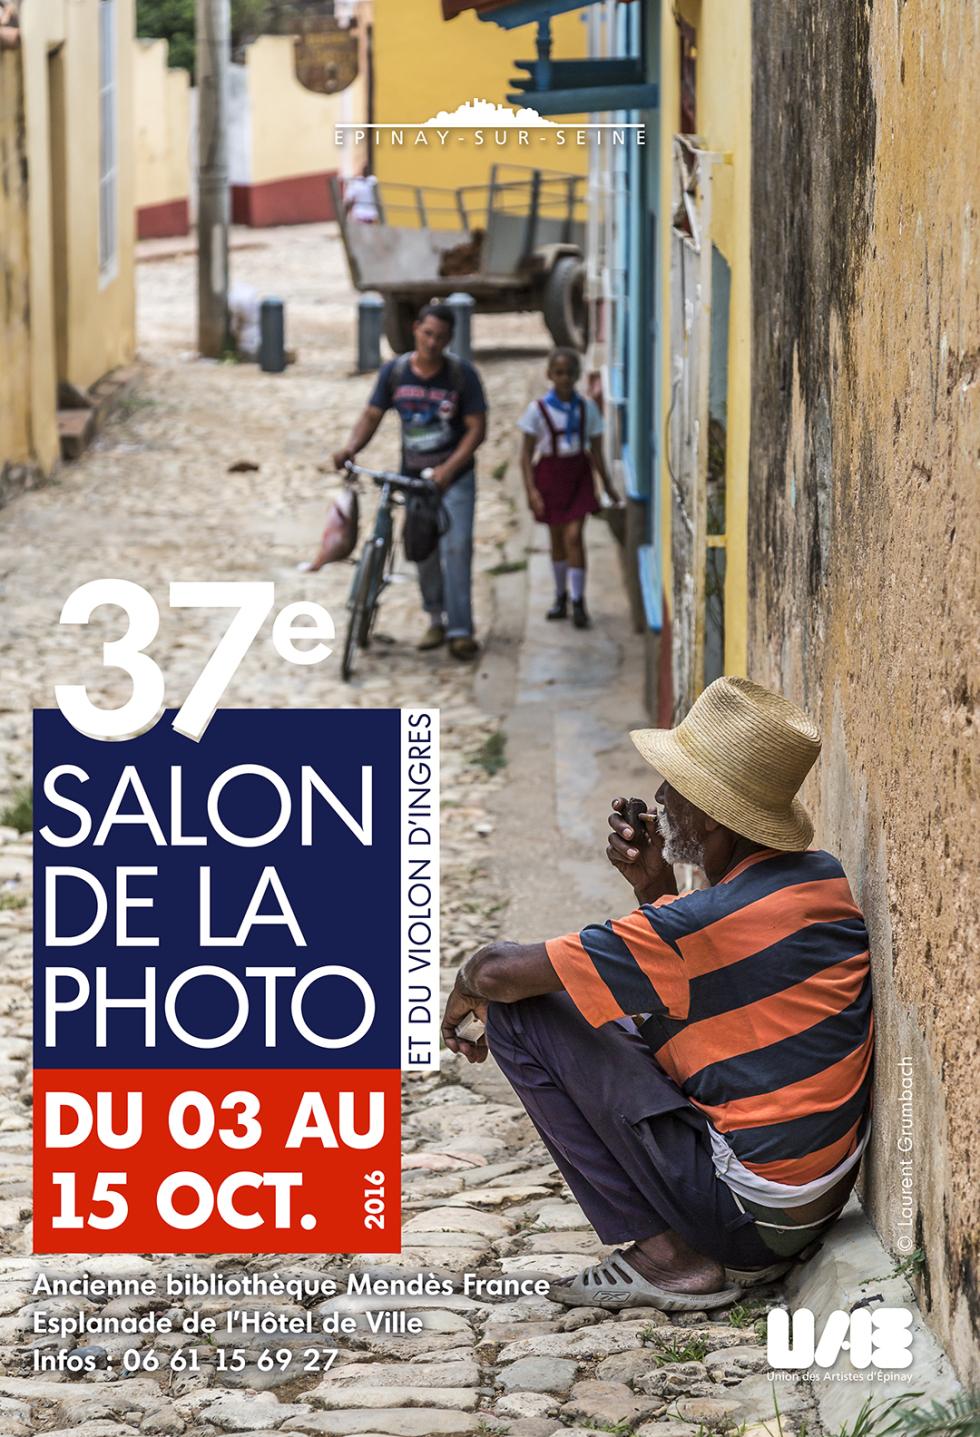 SALON DE LA PHOTO EPINAY SUR SEINE 2016